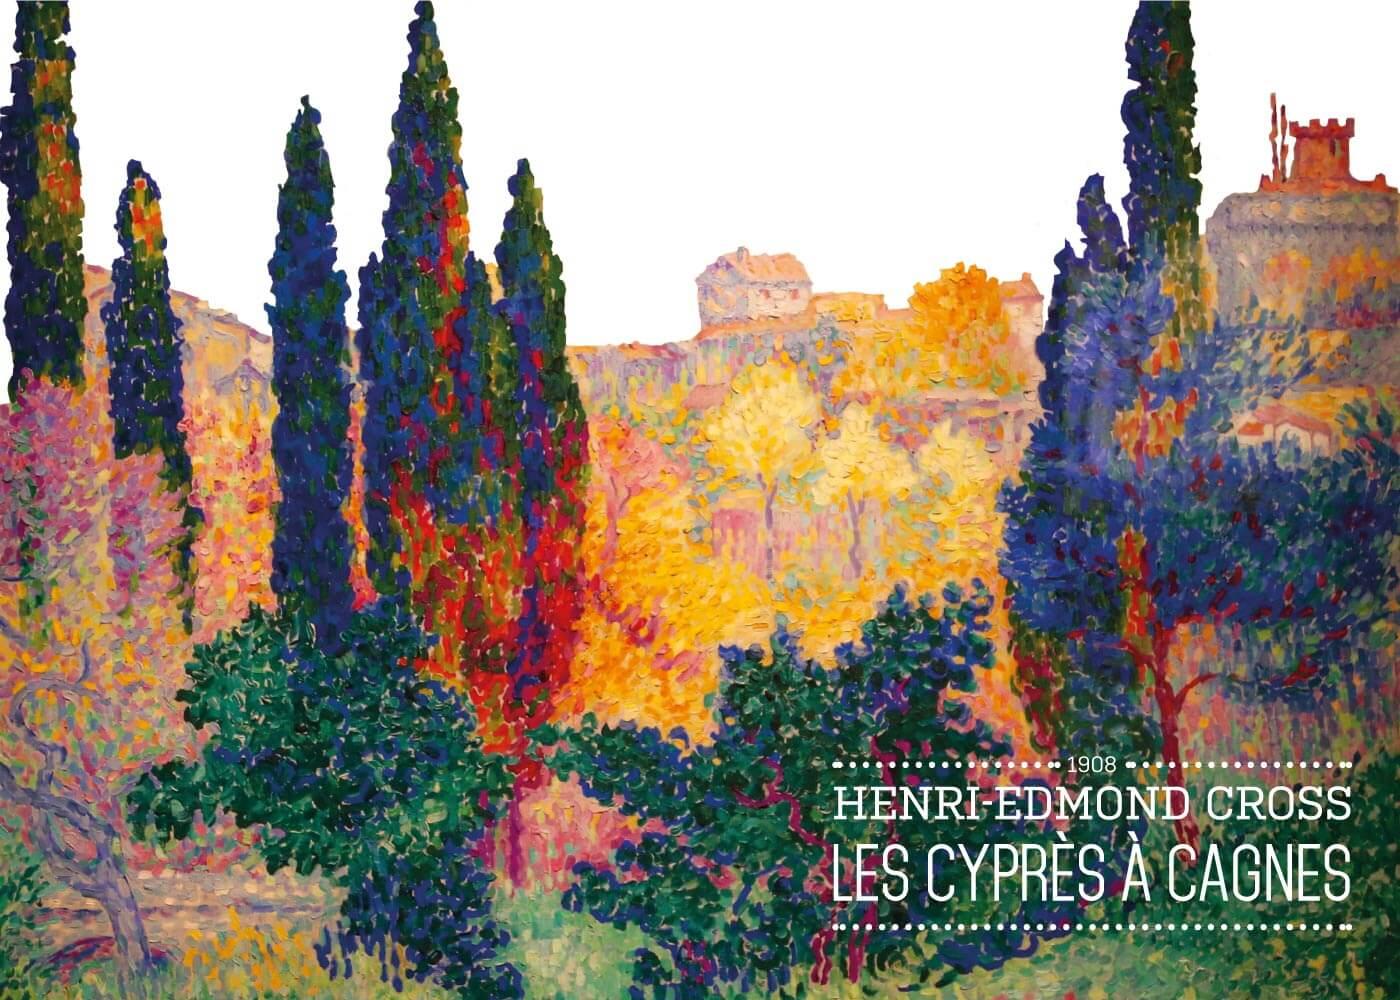 Billede af Les Cyprése á cagnes - Henri-Edmond Cross